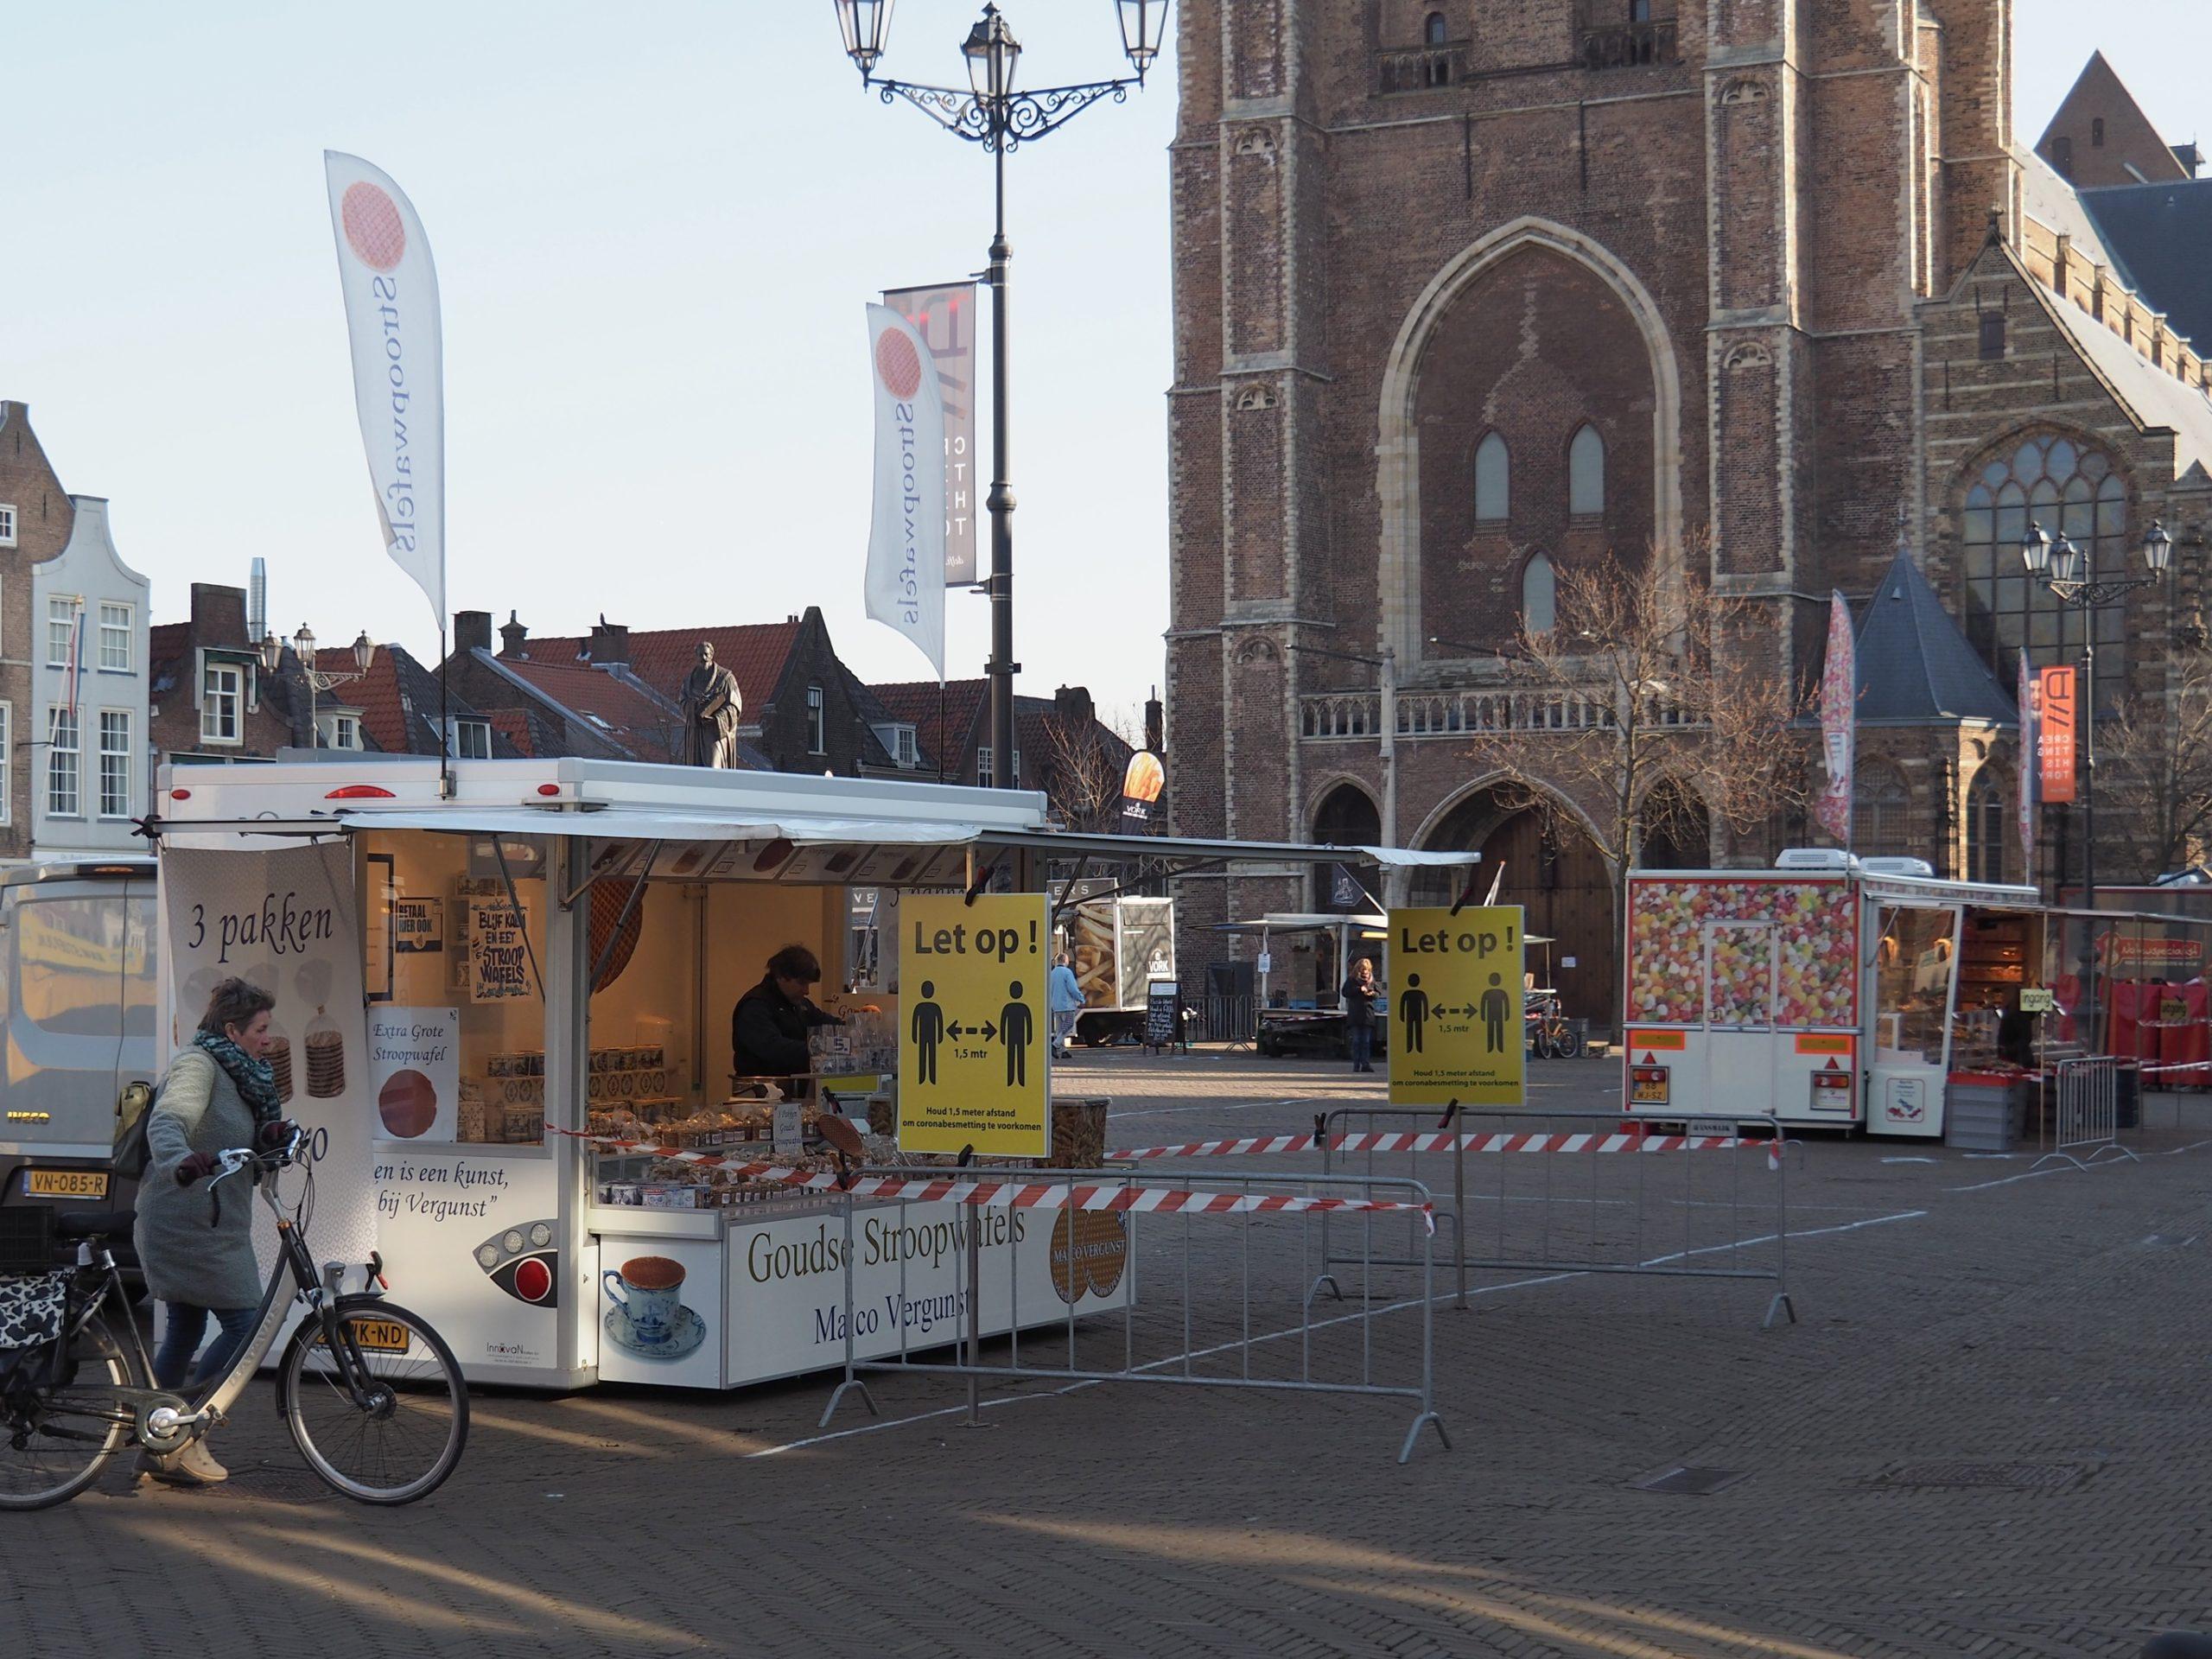 Advertising incomes fall by around 30% as coronavirus hits spending - DutchNews.nl